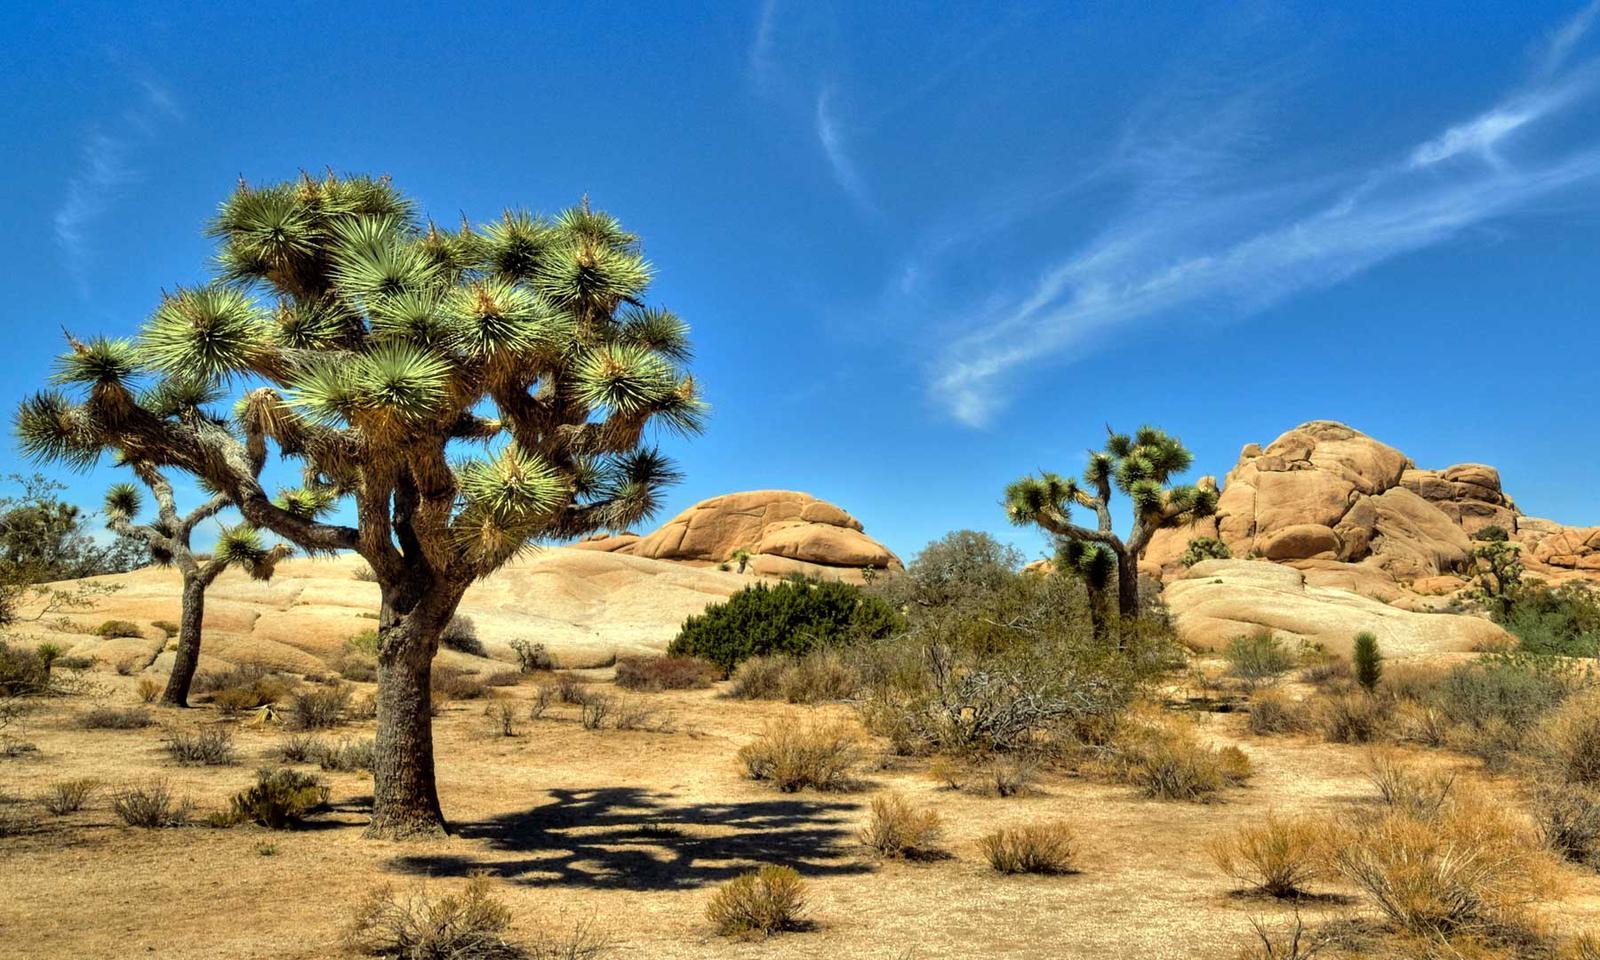 Los Angeles Joshua Tree